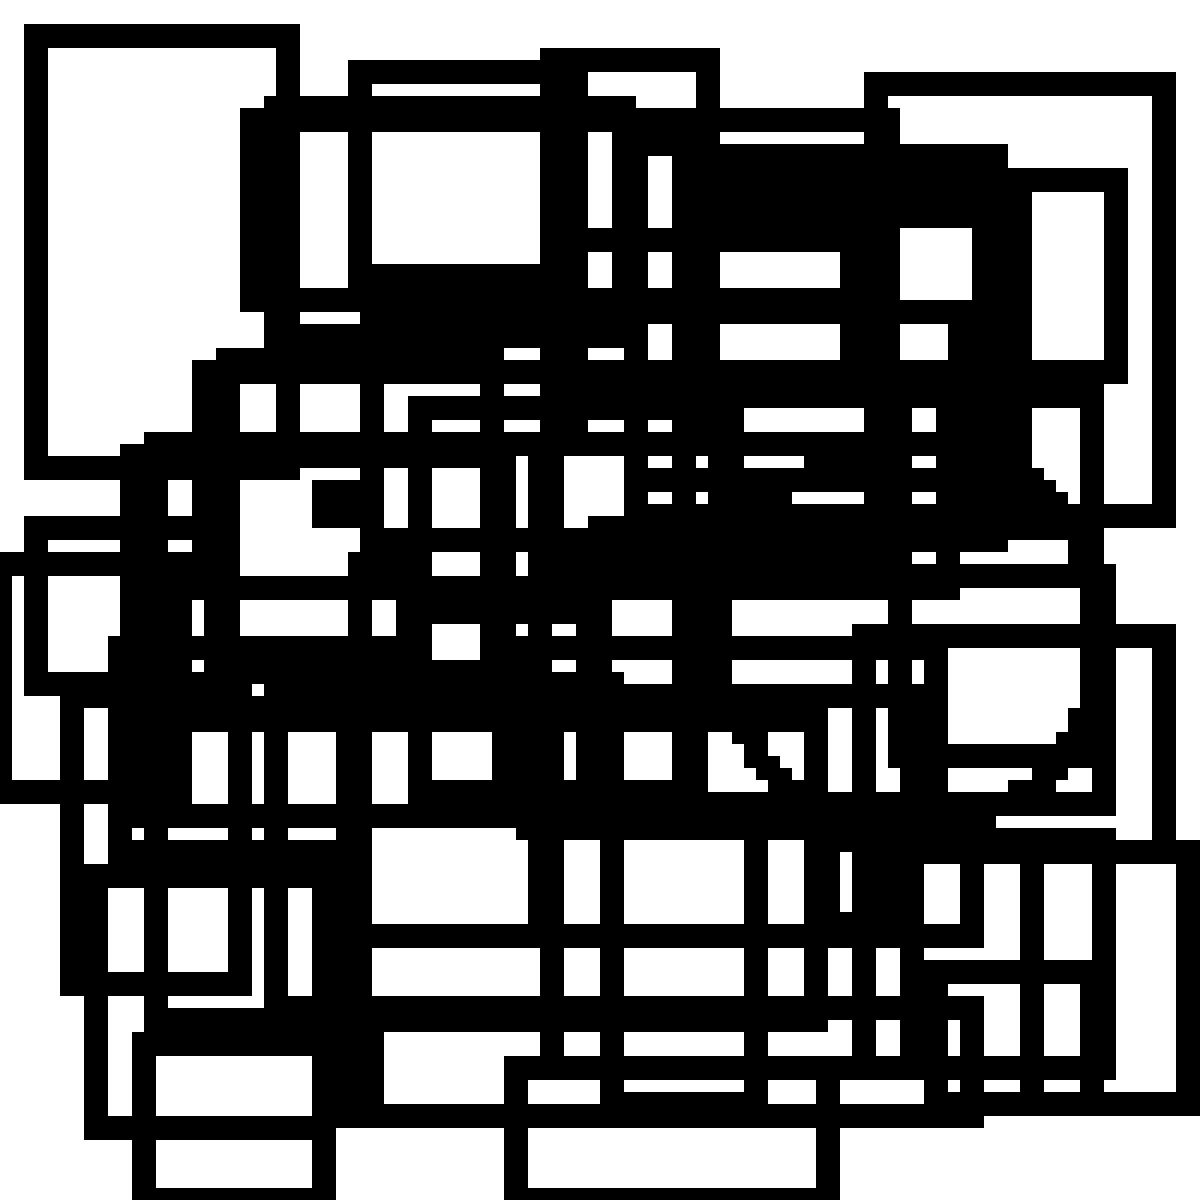 squares by Zane54329